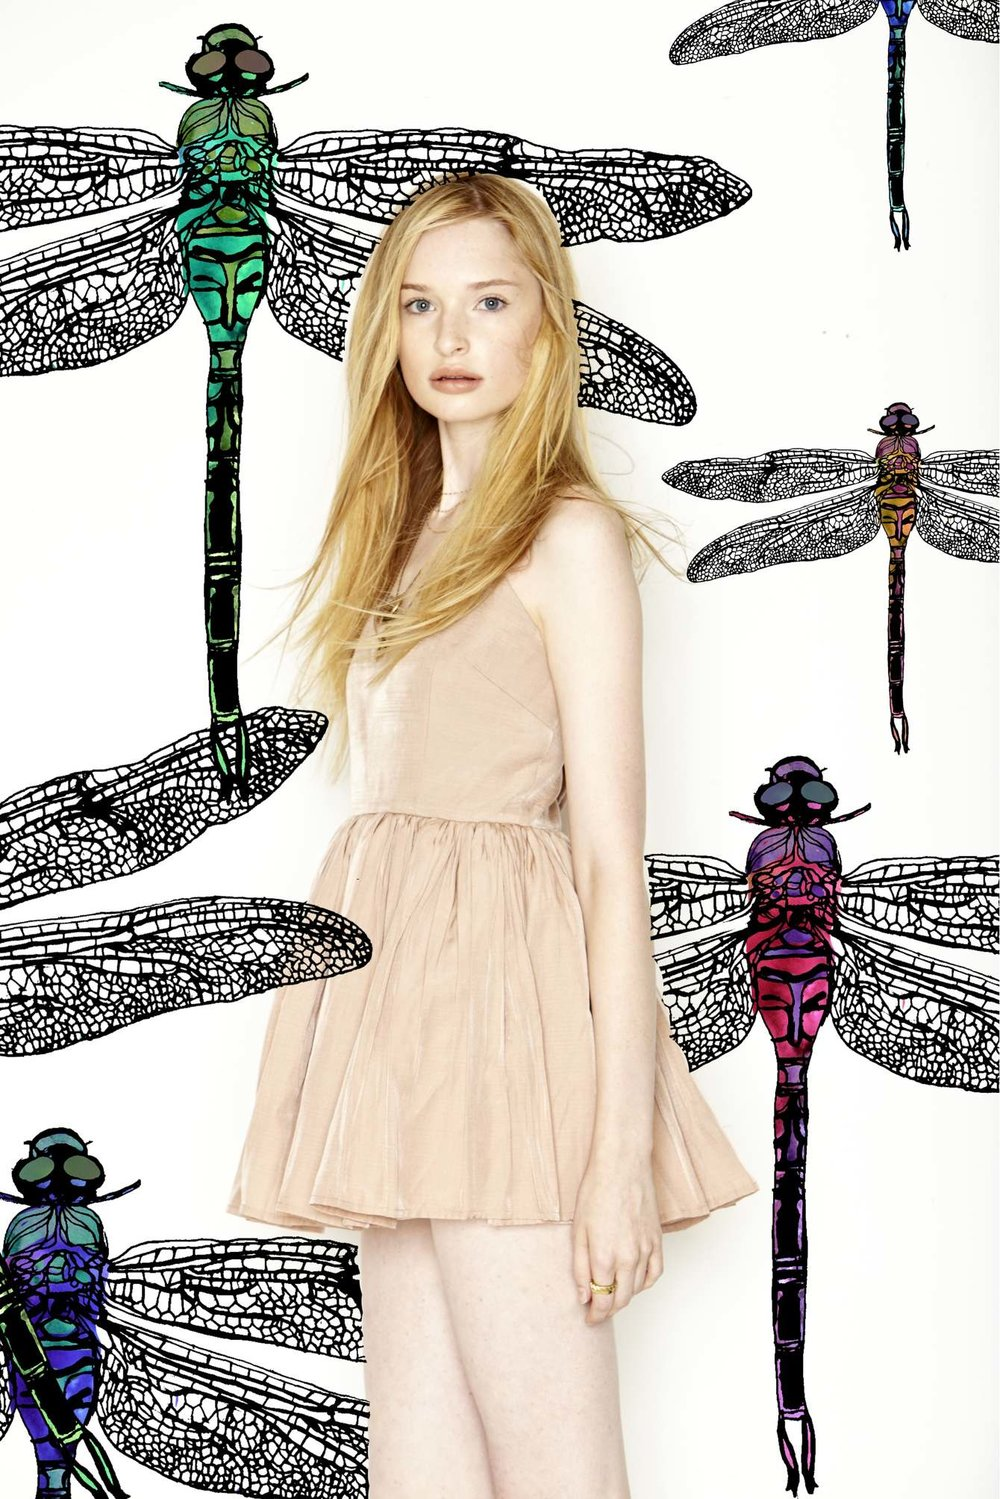 dragonflies_1340_c.jpg